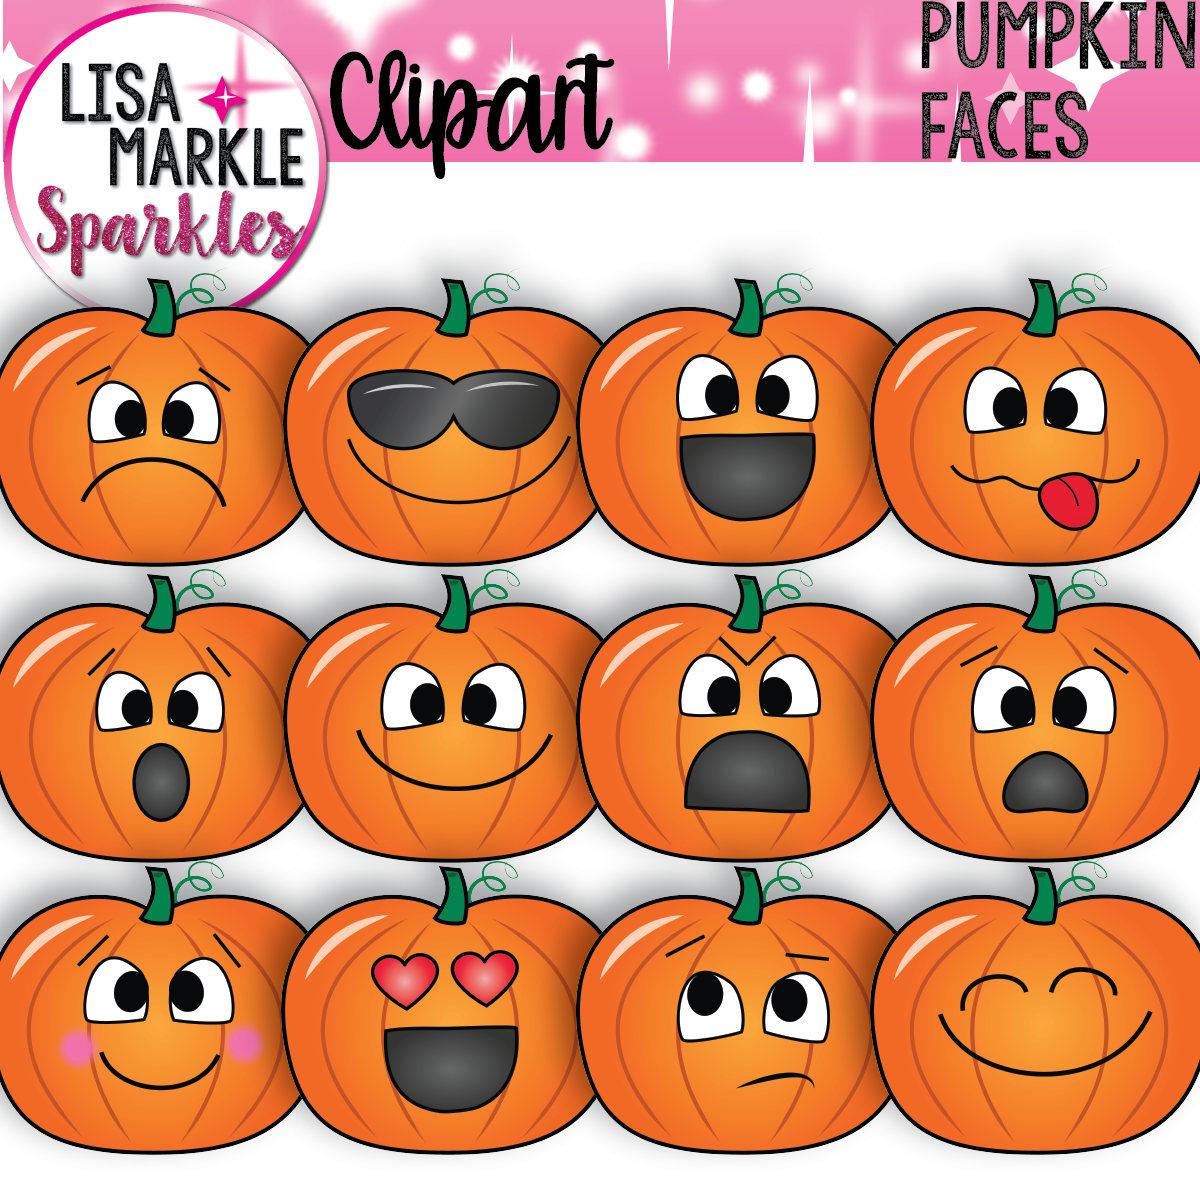 Pumpkin Face Pictures: Fall Clipart Pumpkin Clipart Back To School Clipart Emoji